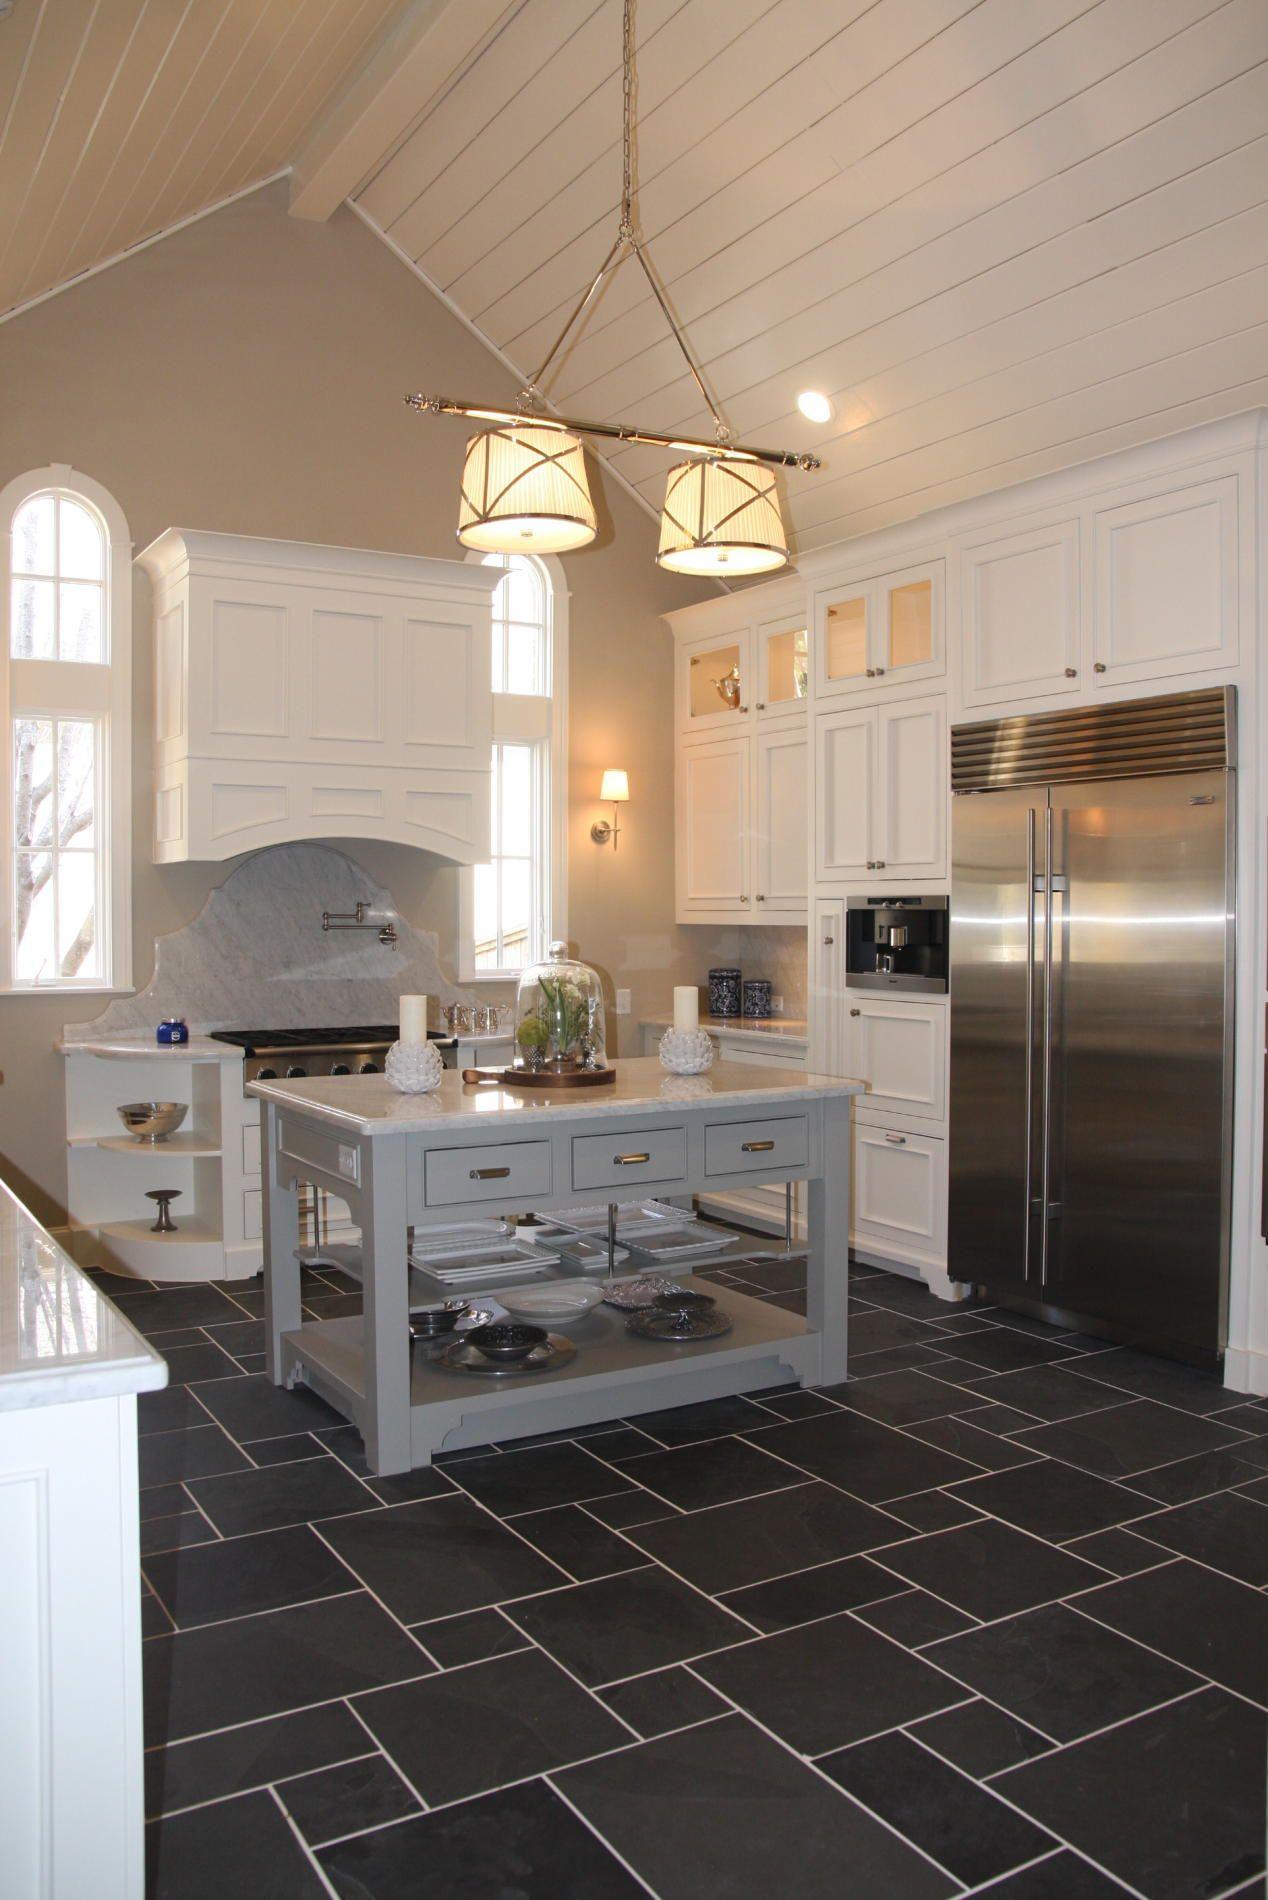 Slate Kitchen Floor Dark Cabinets